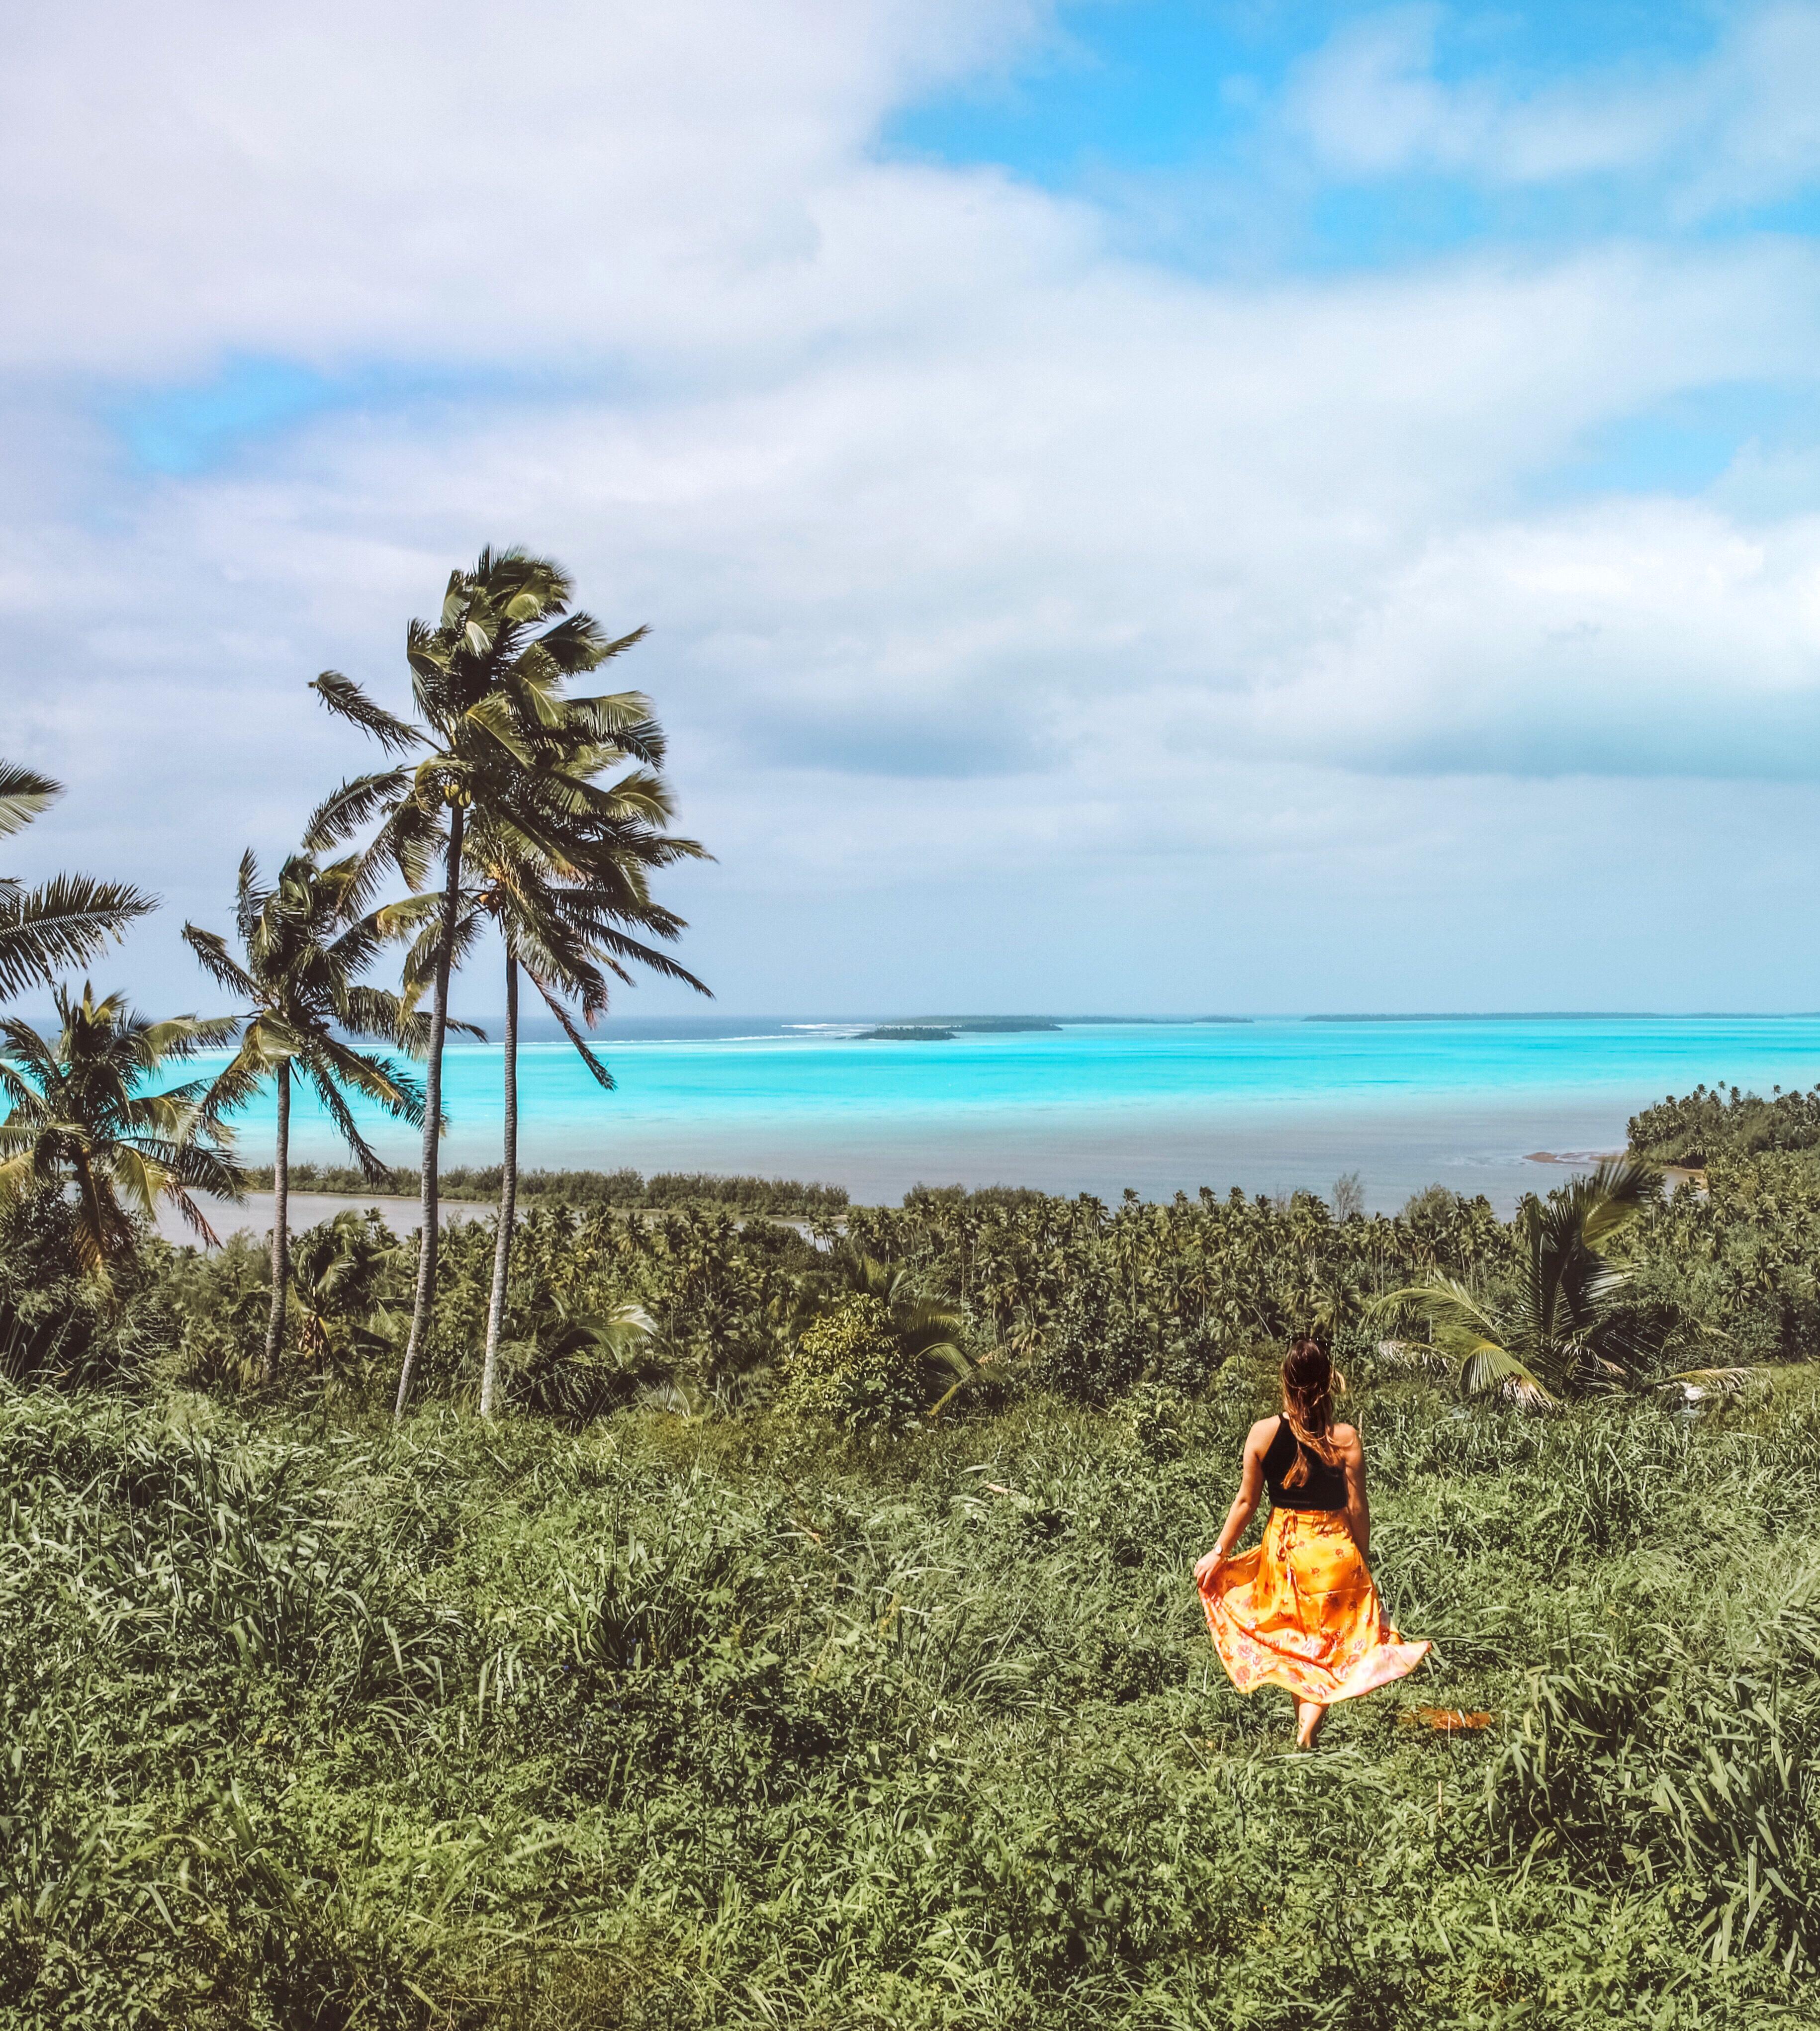 Cook Islands Rarotonga Beach: 11 Best Things To Do In Rarotonga, Cook Islands